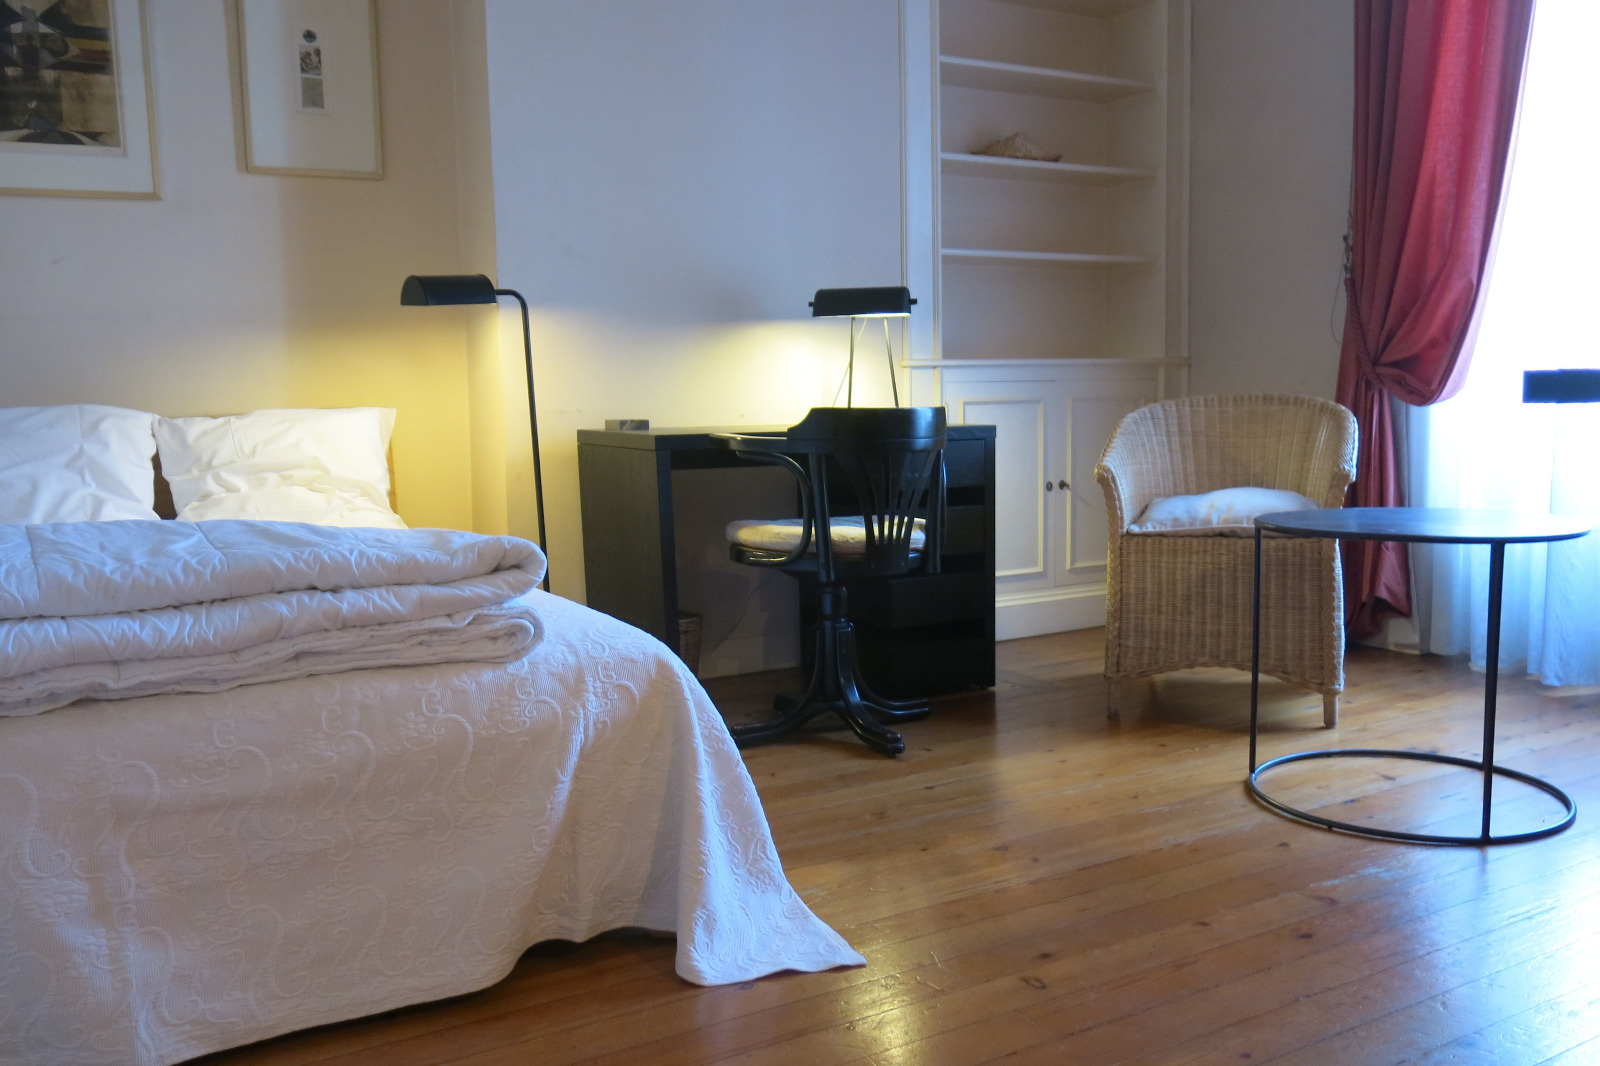 location proche cours du m doc chartrons location. Black Bedroom Furniture Sets. Home Design Ideas